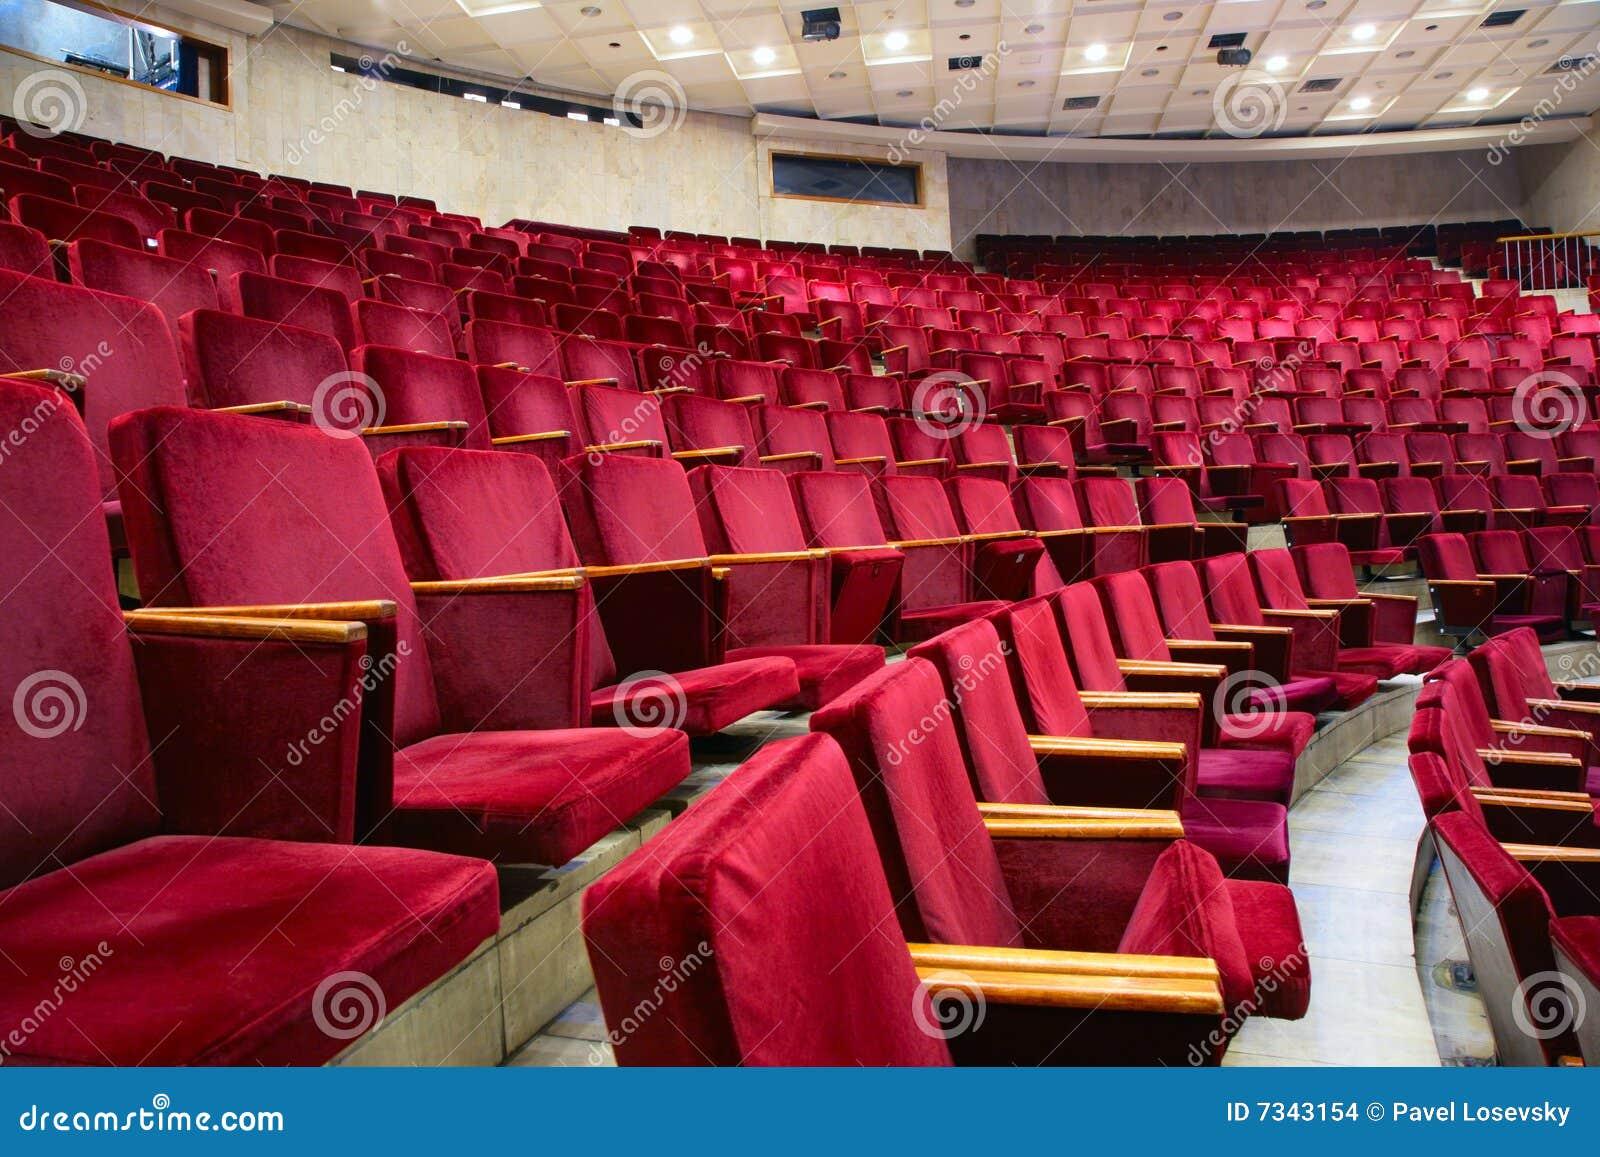 Karła theatre